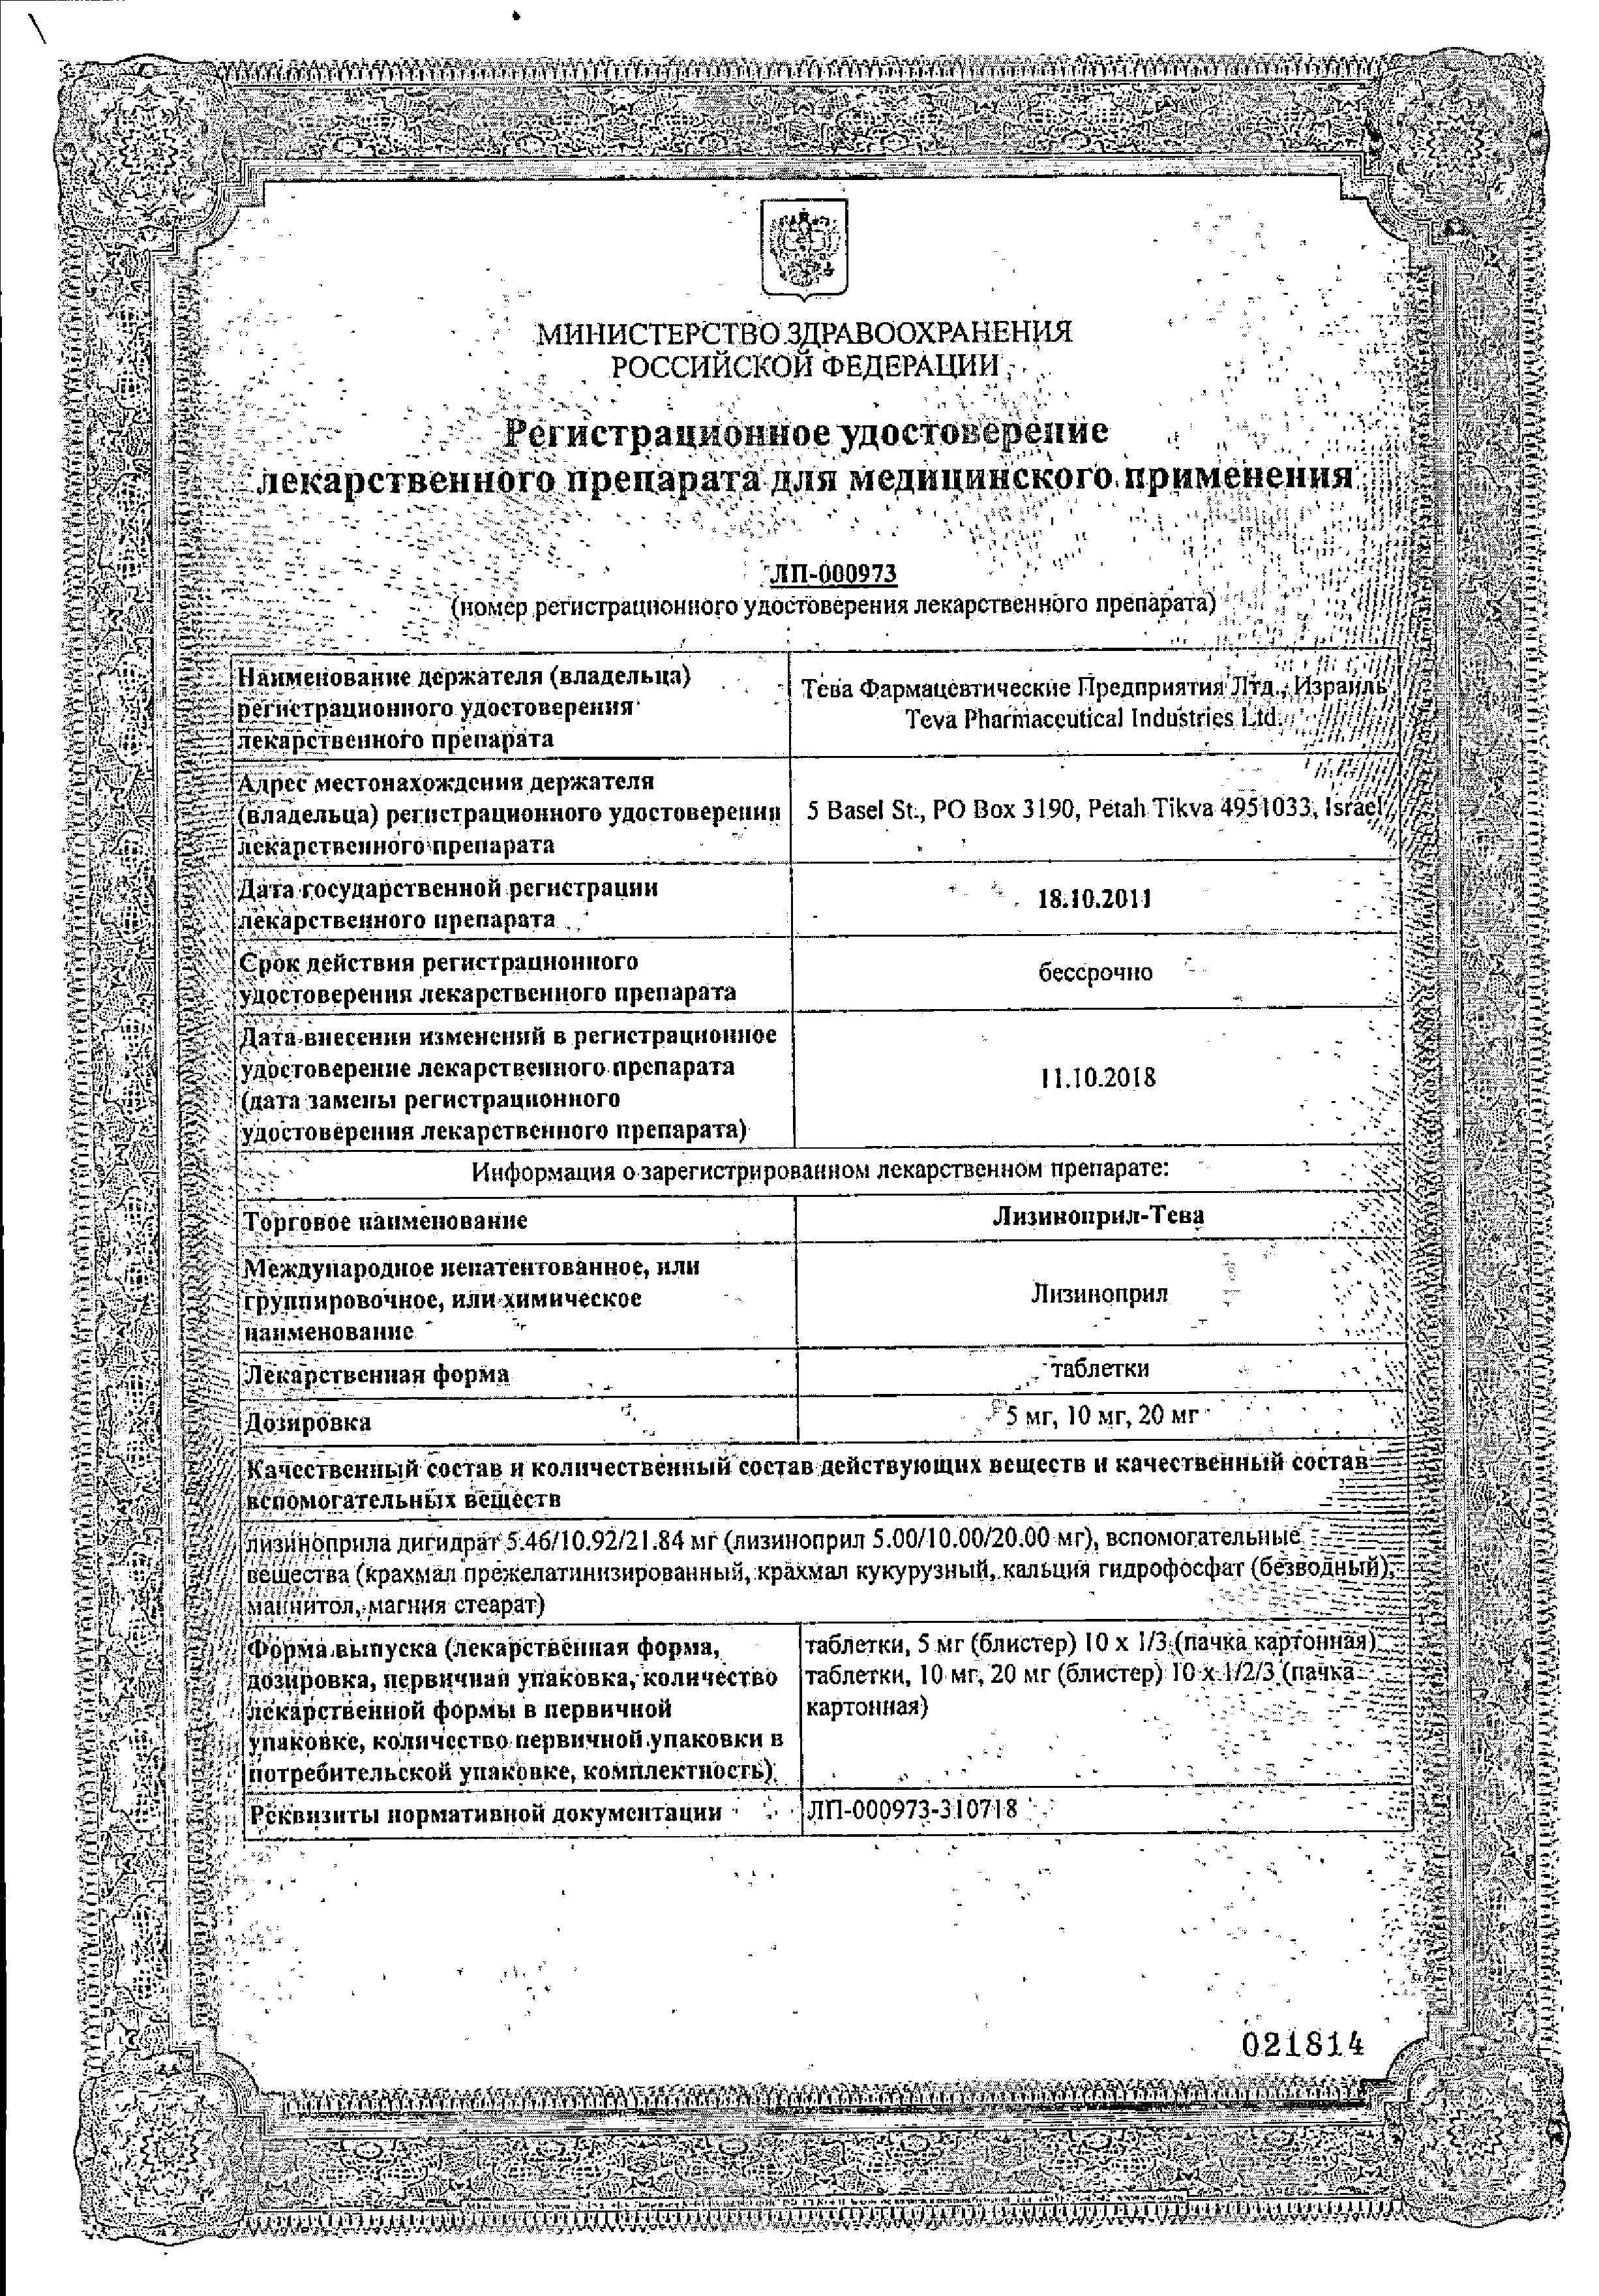 Лизиноприл-Тева сертификат